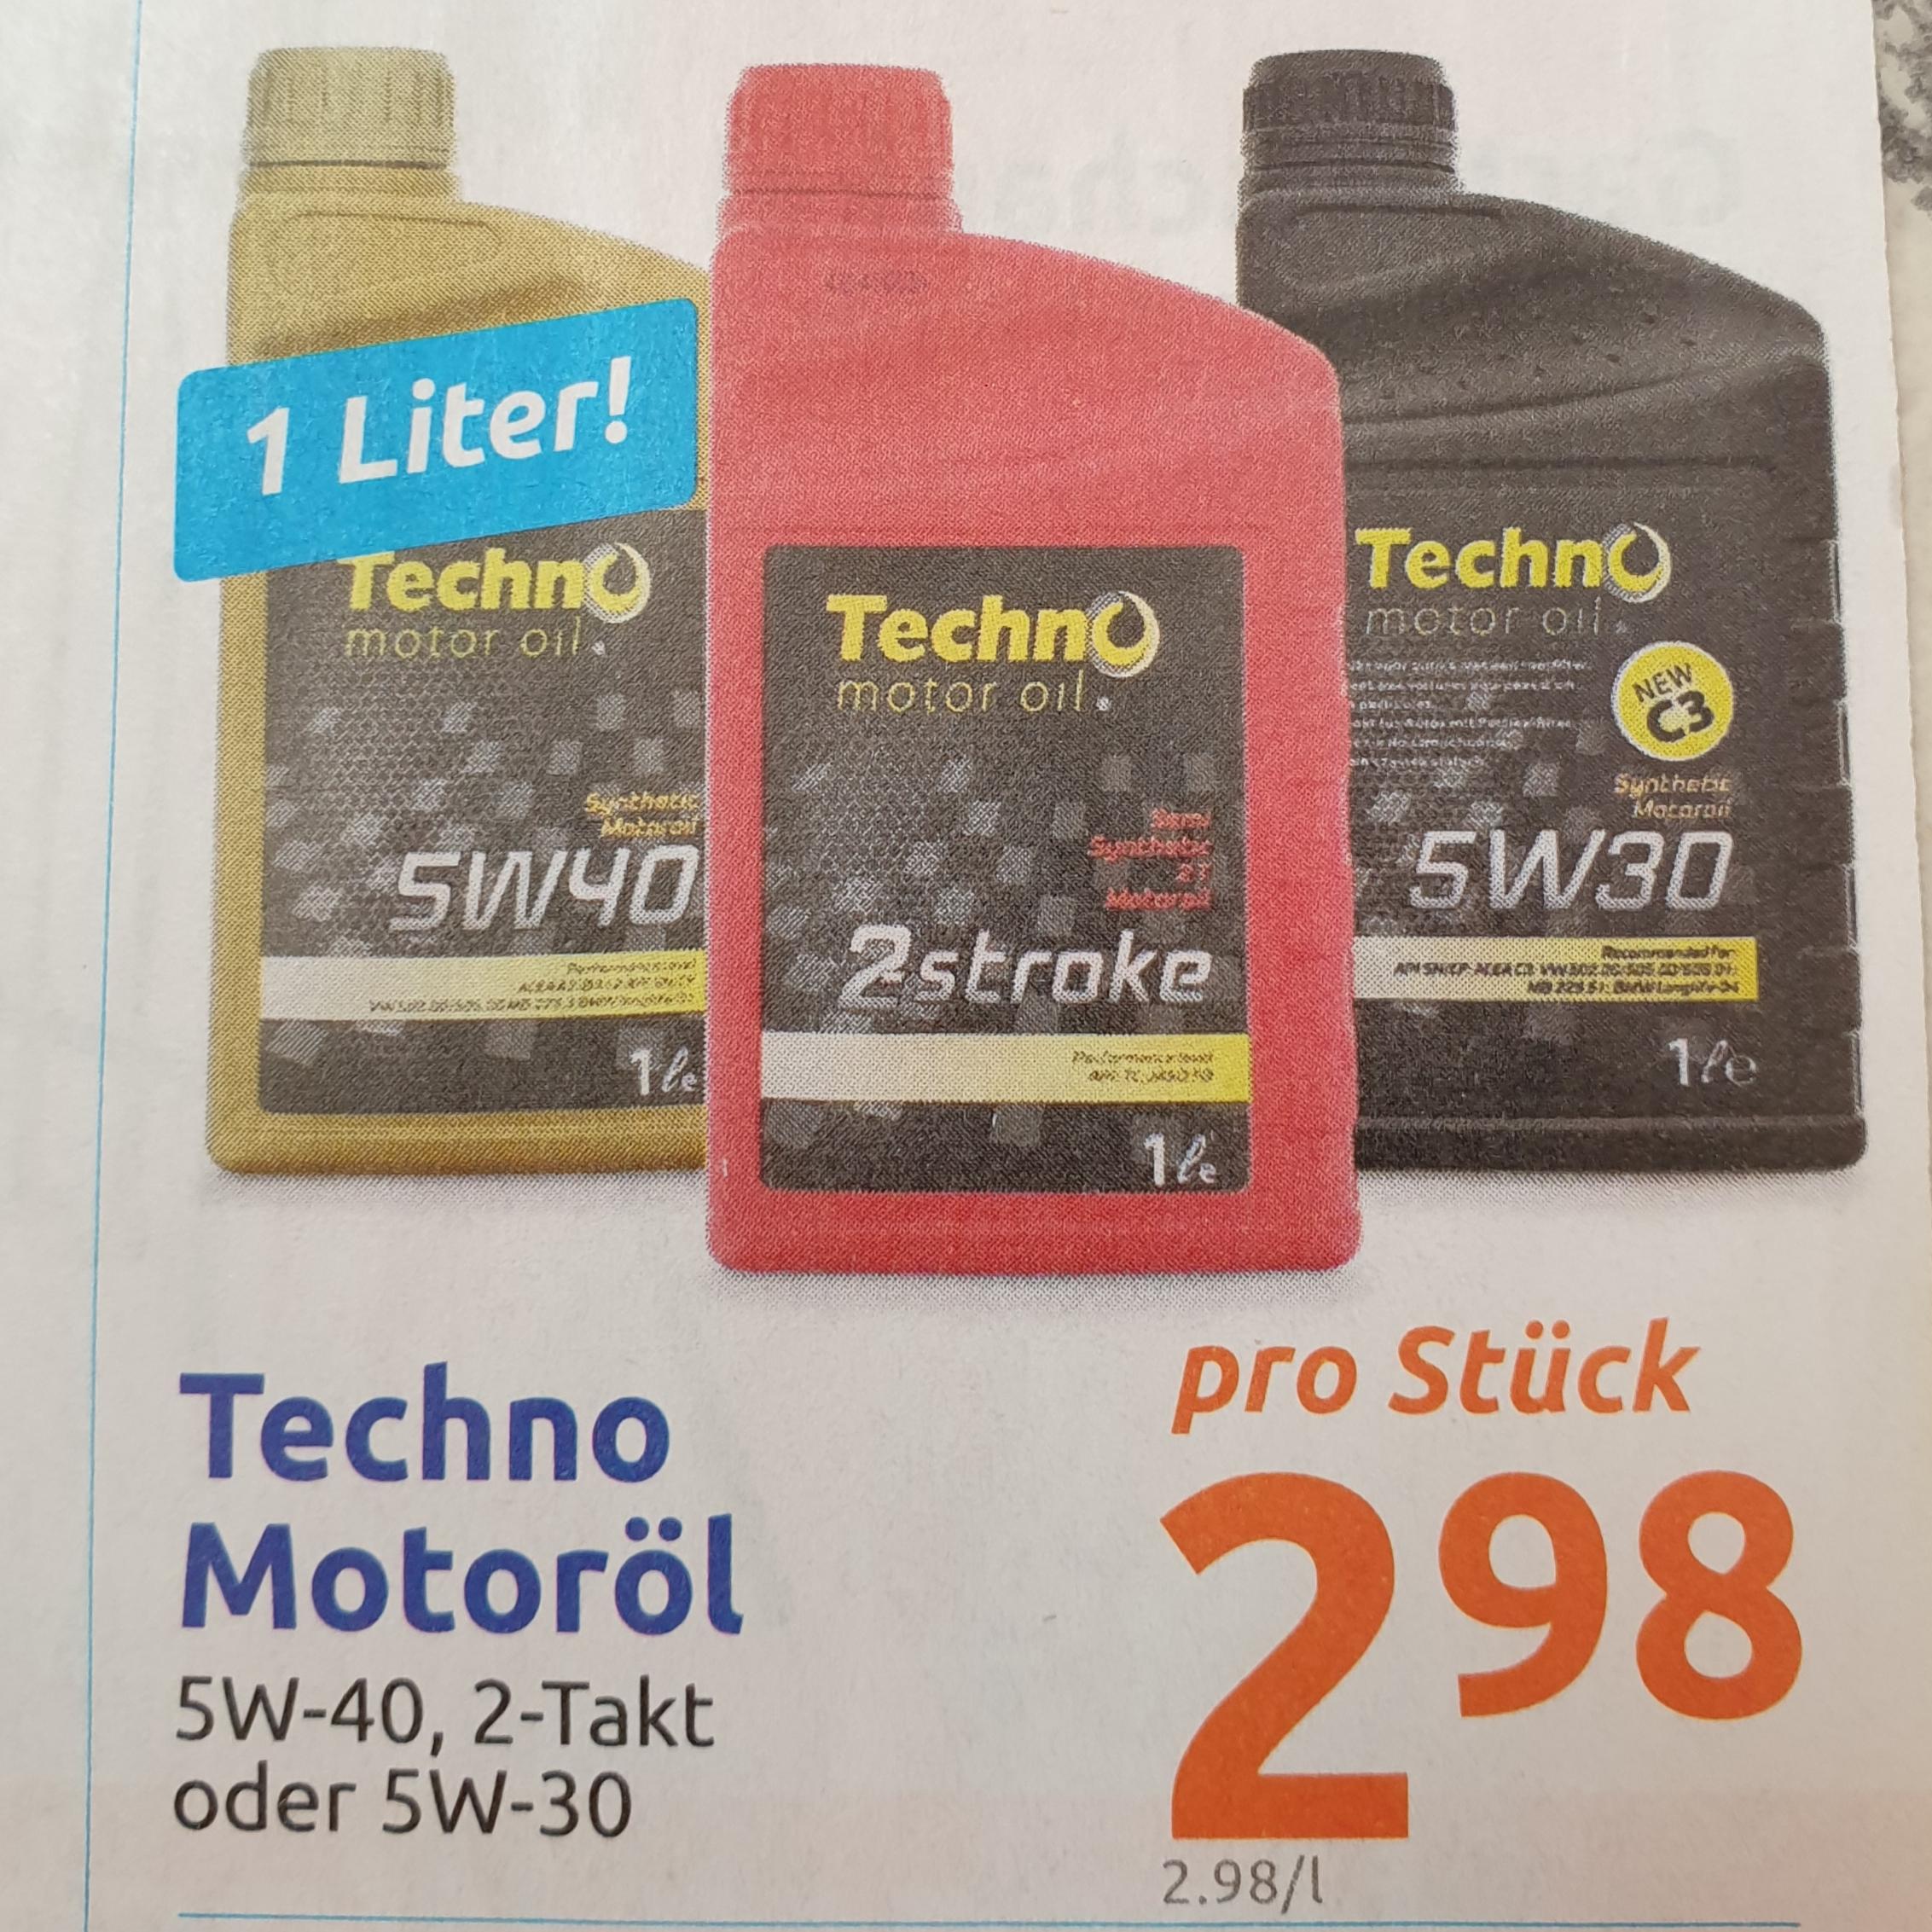 ( Action ) Techno Motoröl 5w40/2-Takt/5w30 je 2,98€/Liter